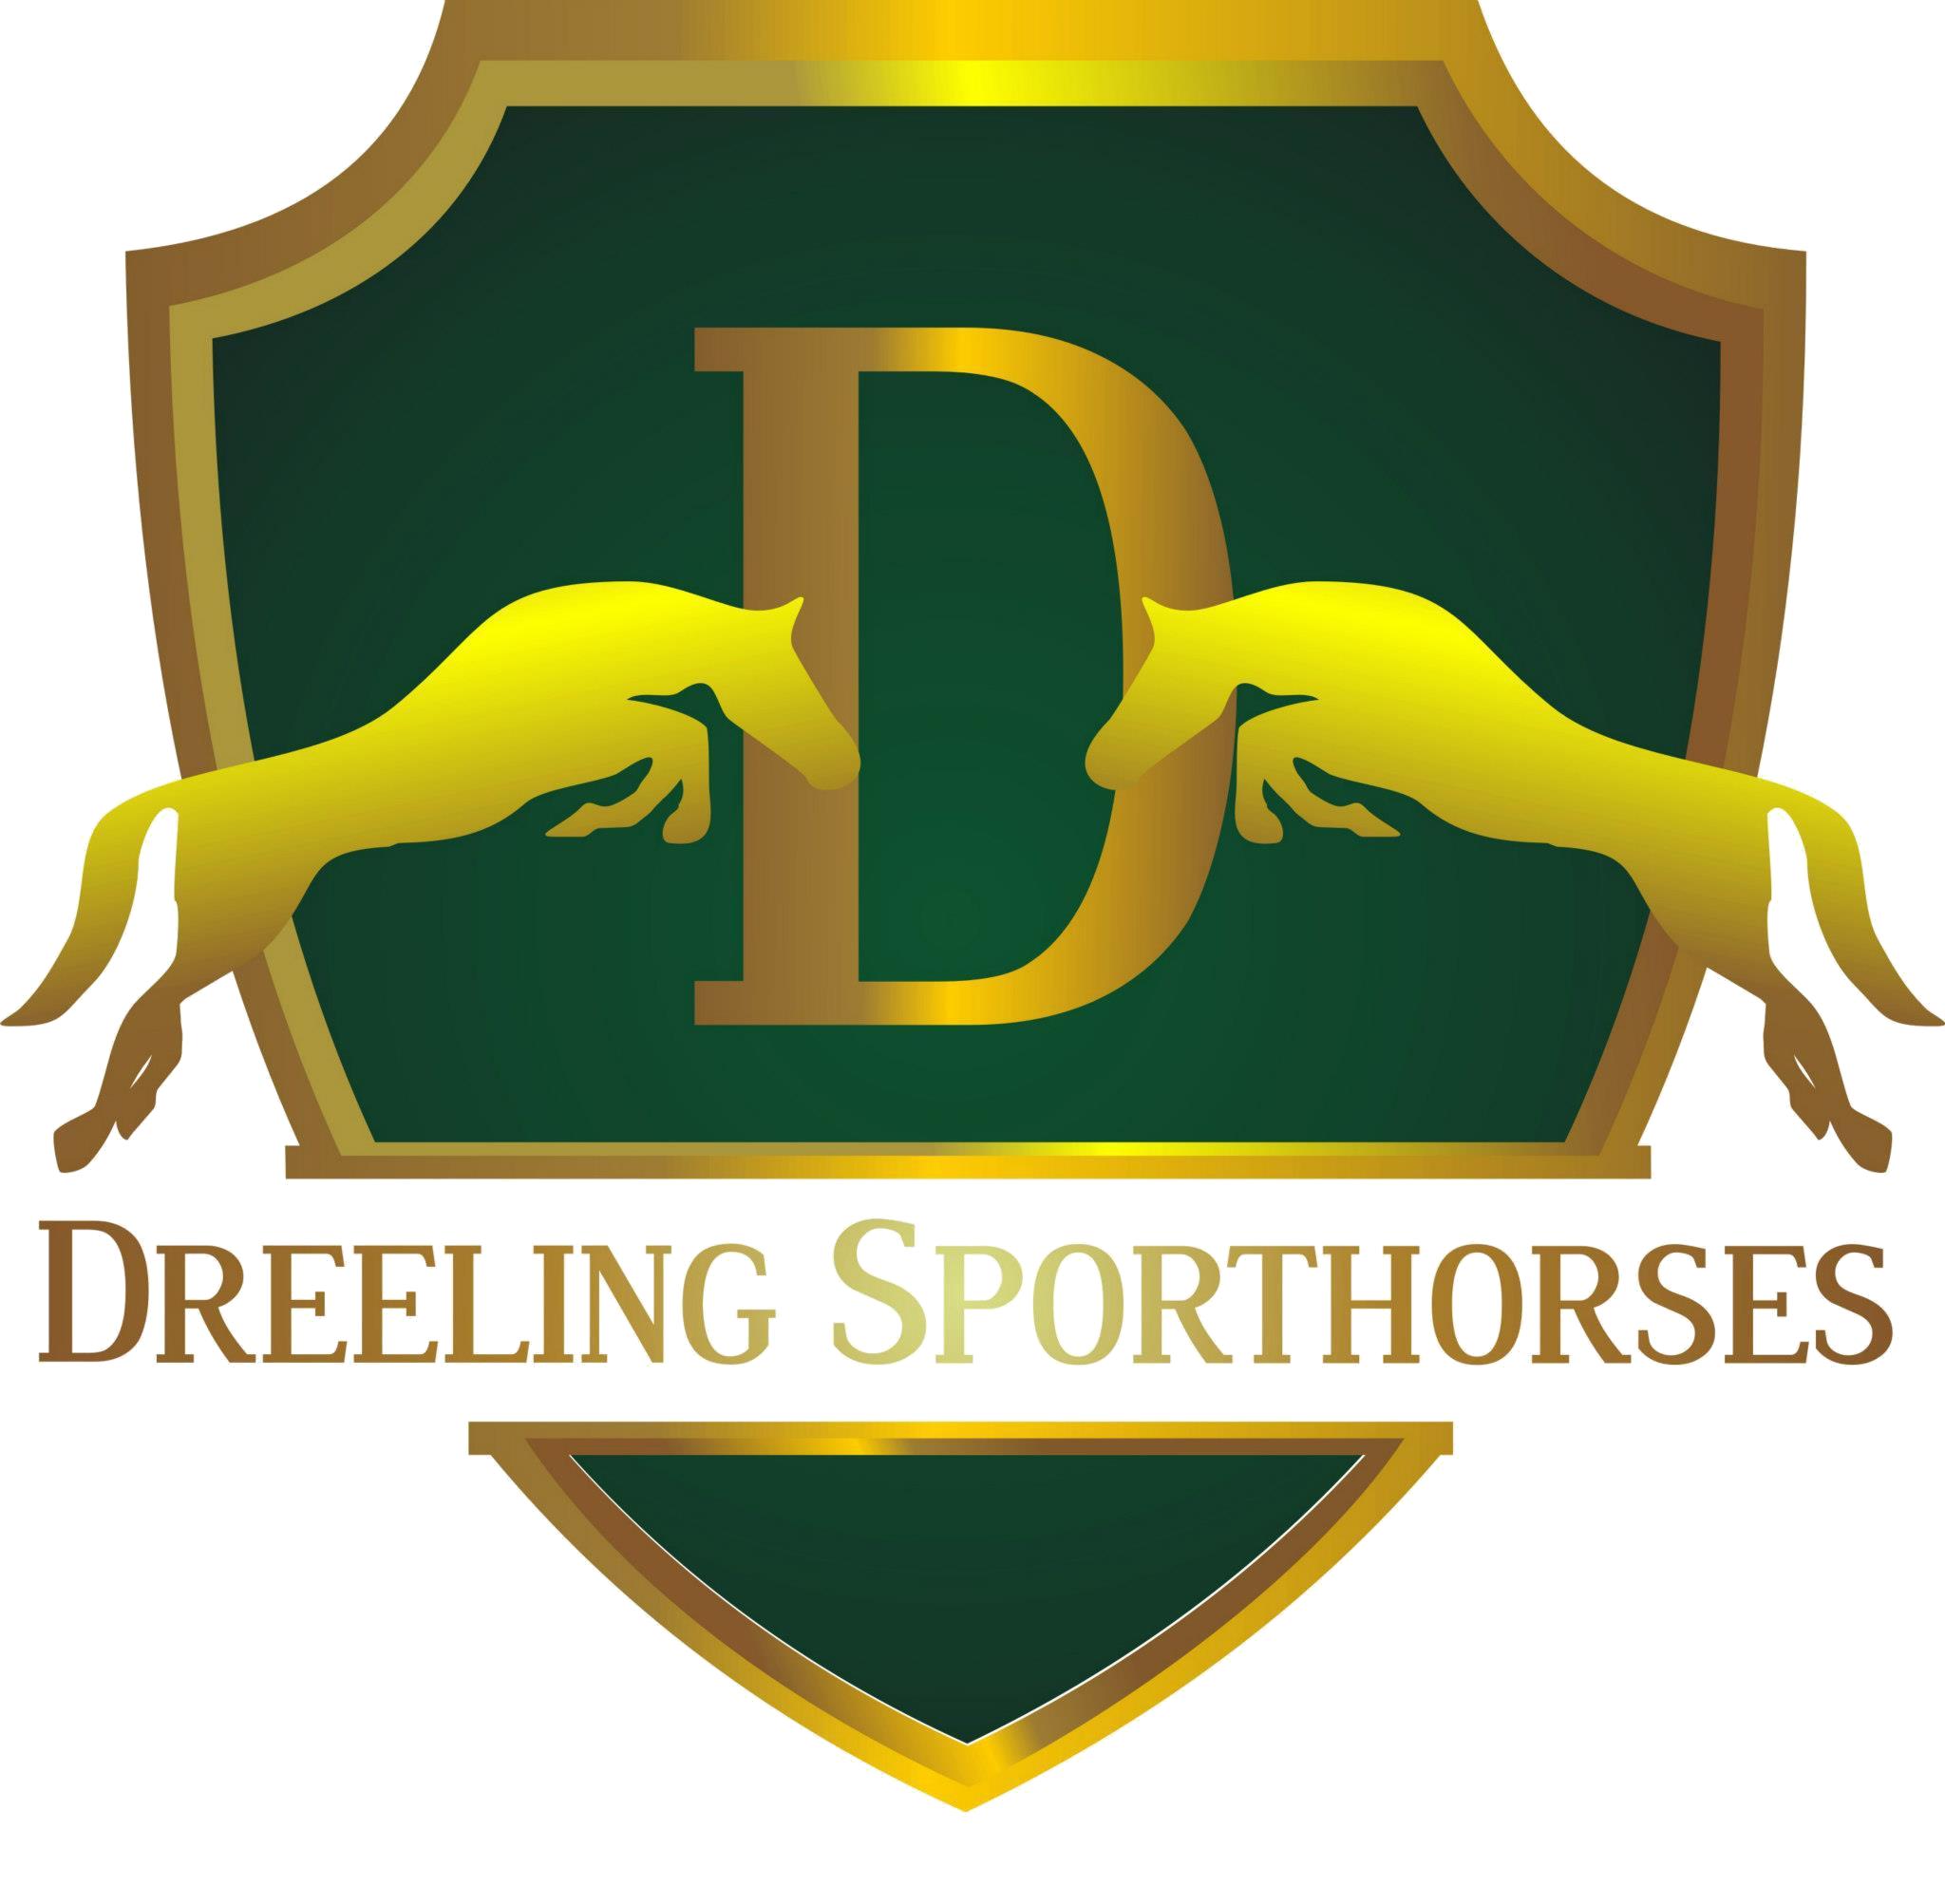 Dreeling Sporthorses